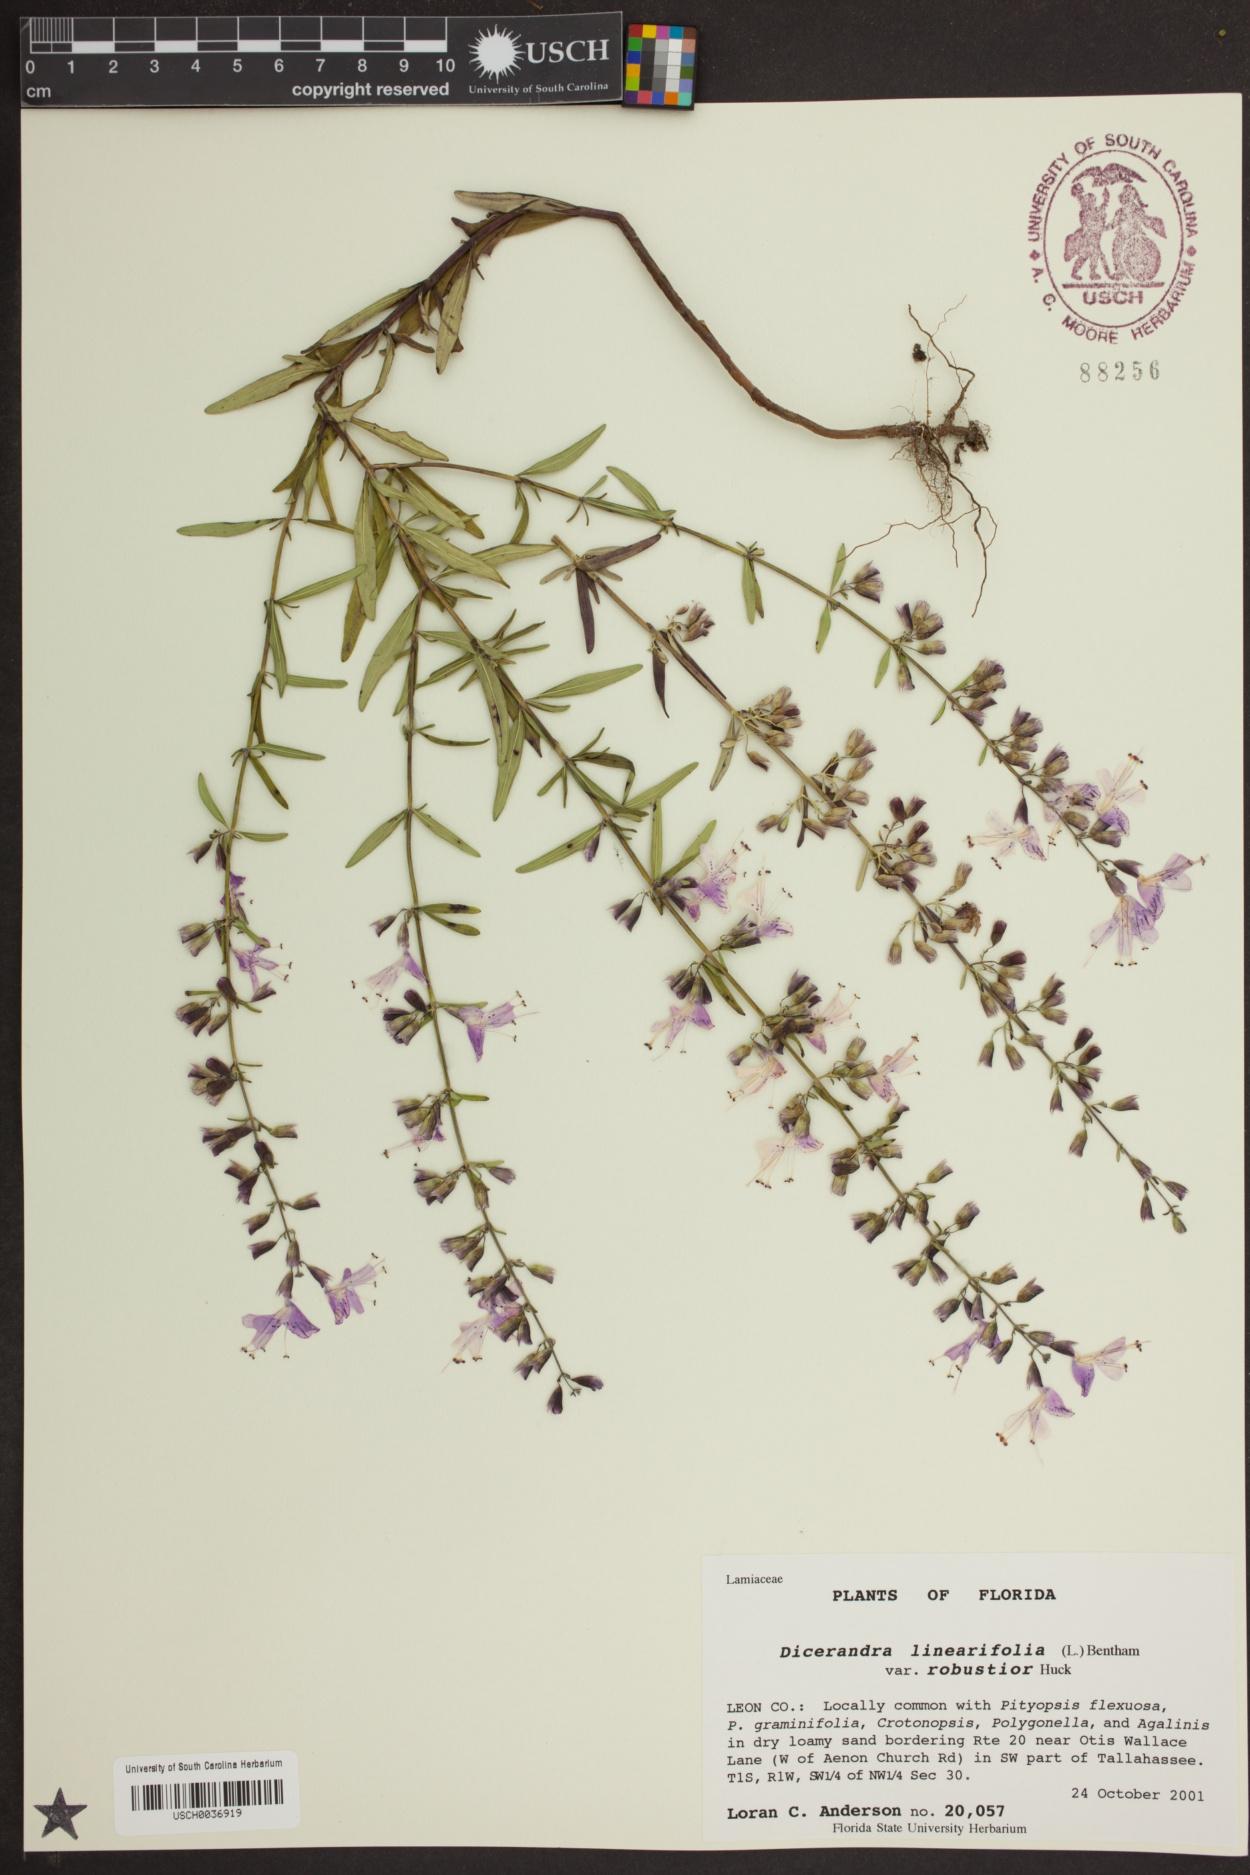 Dicerandra linearifolia var. robustior image